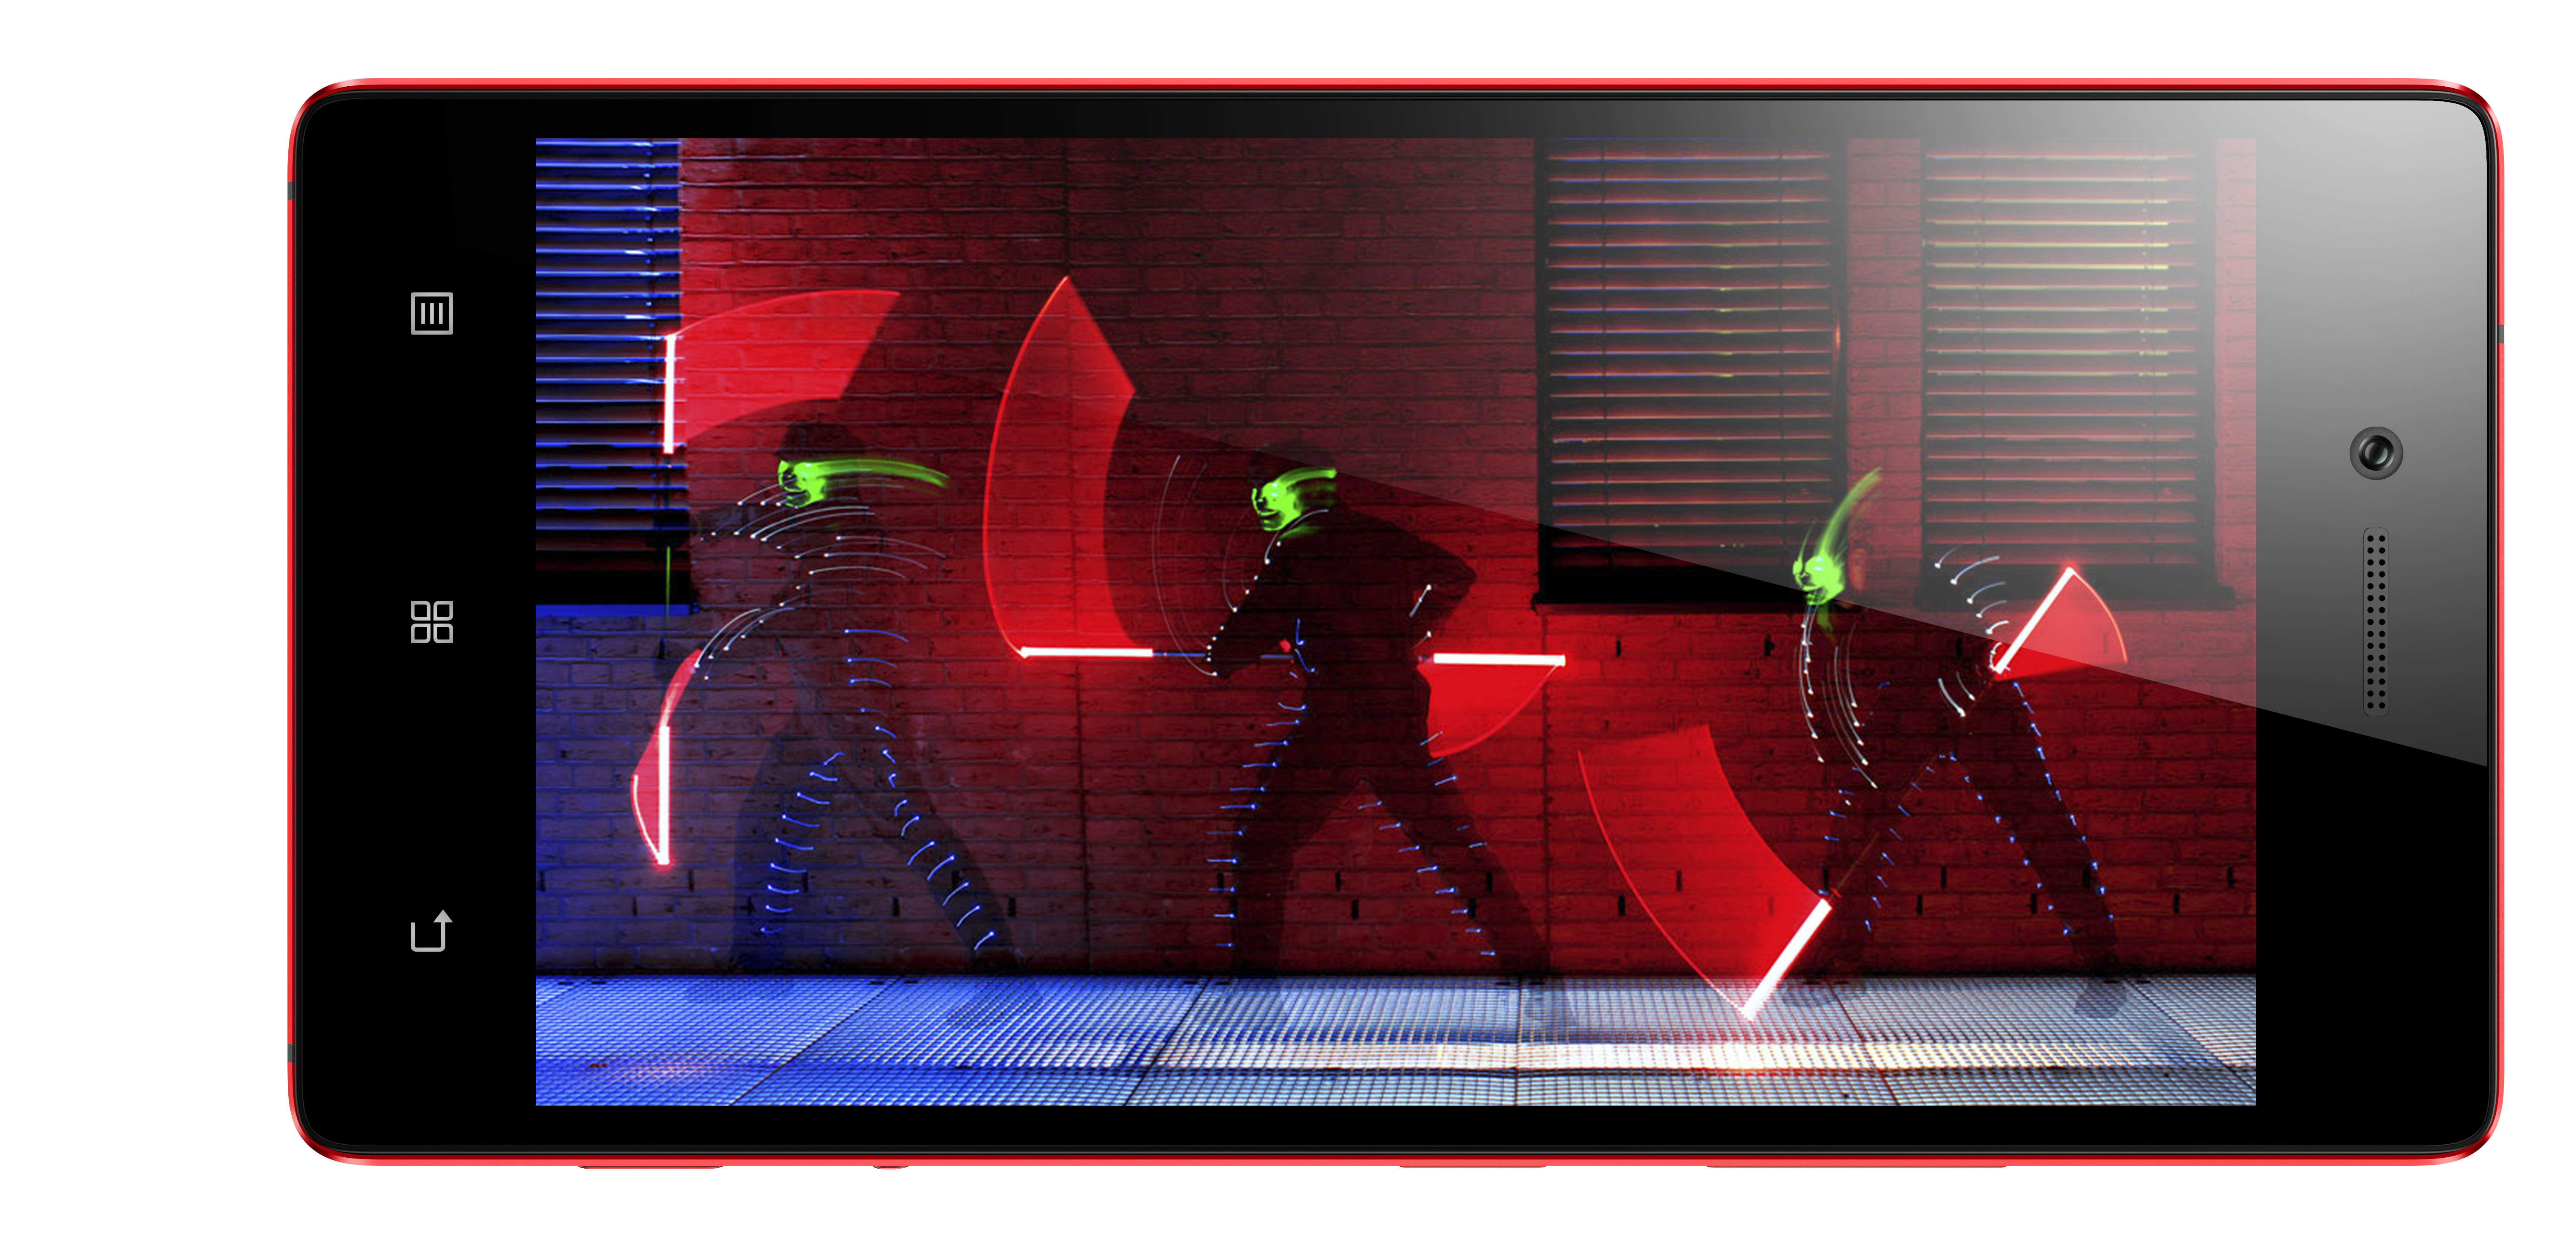 Lenovo launches VIBE Shot camera-centric smartphone: Digital